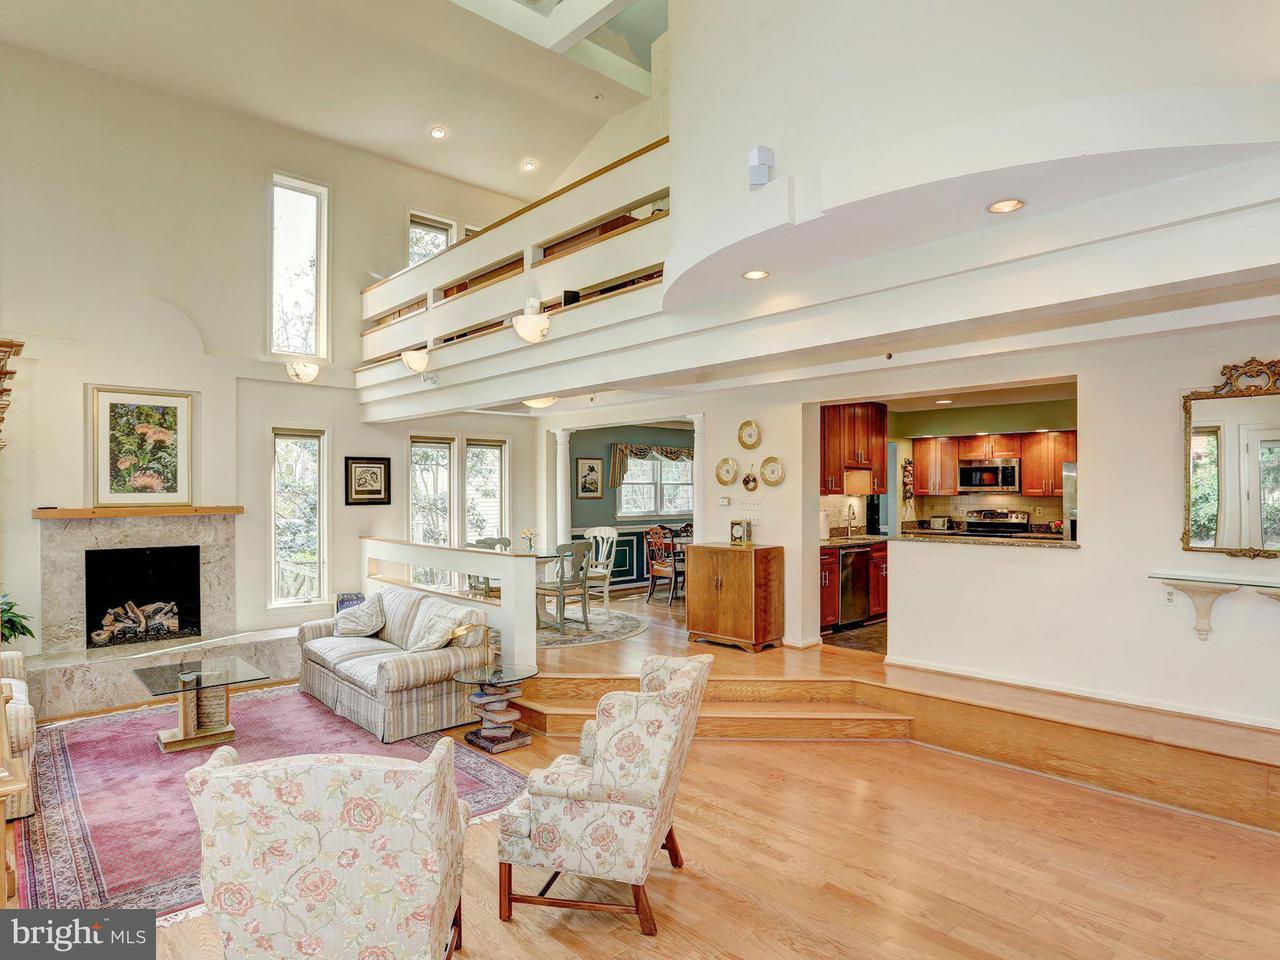 Additional photo for property listing at 239 BARTON ST N 239 BARTON ST N Arlington, Virginia 22201 United States